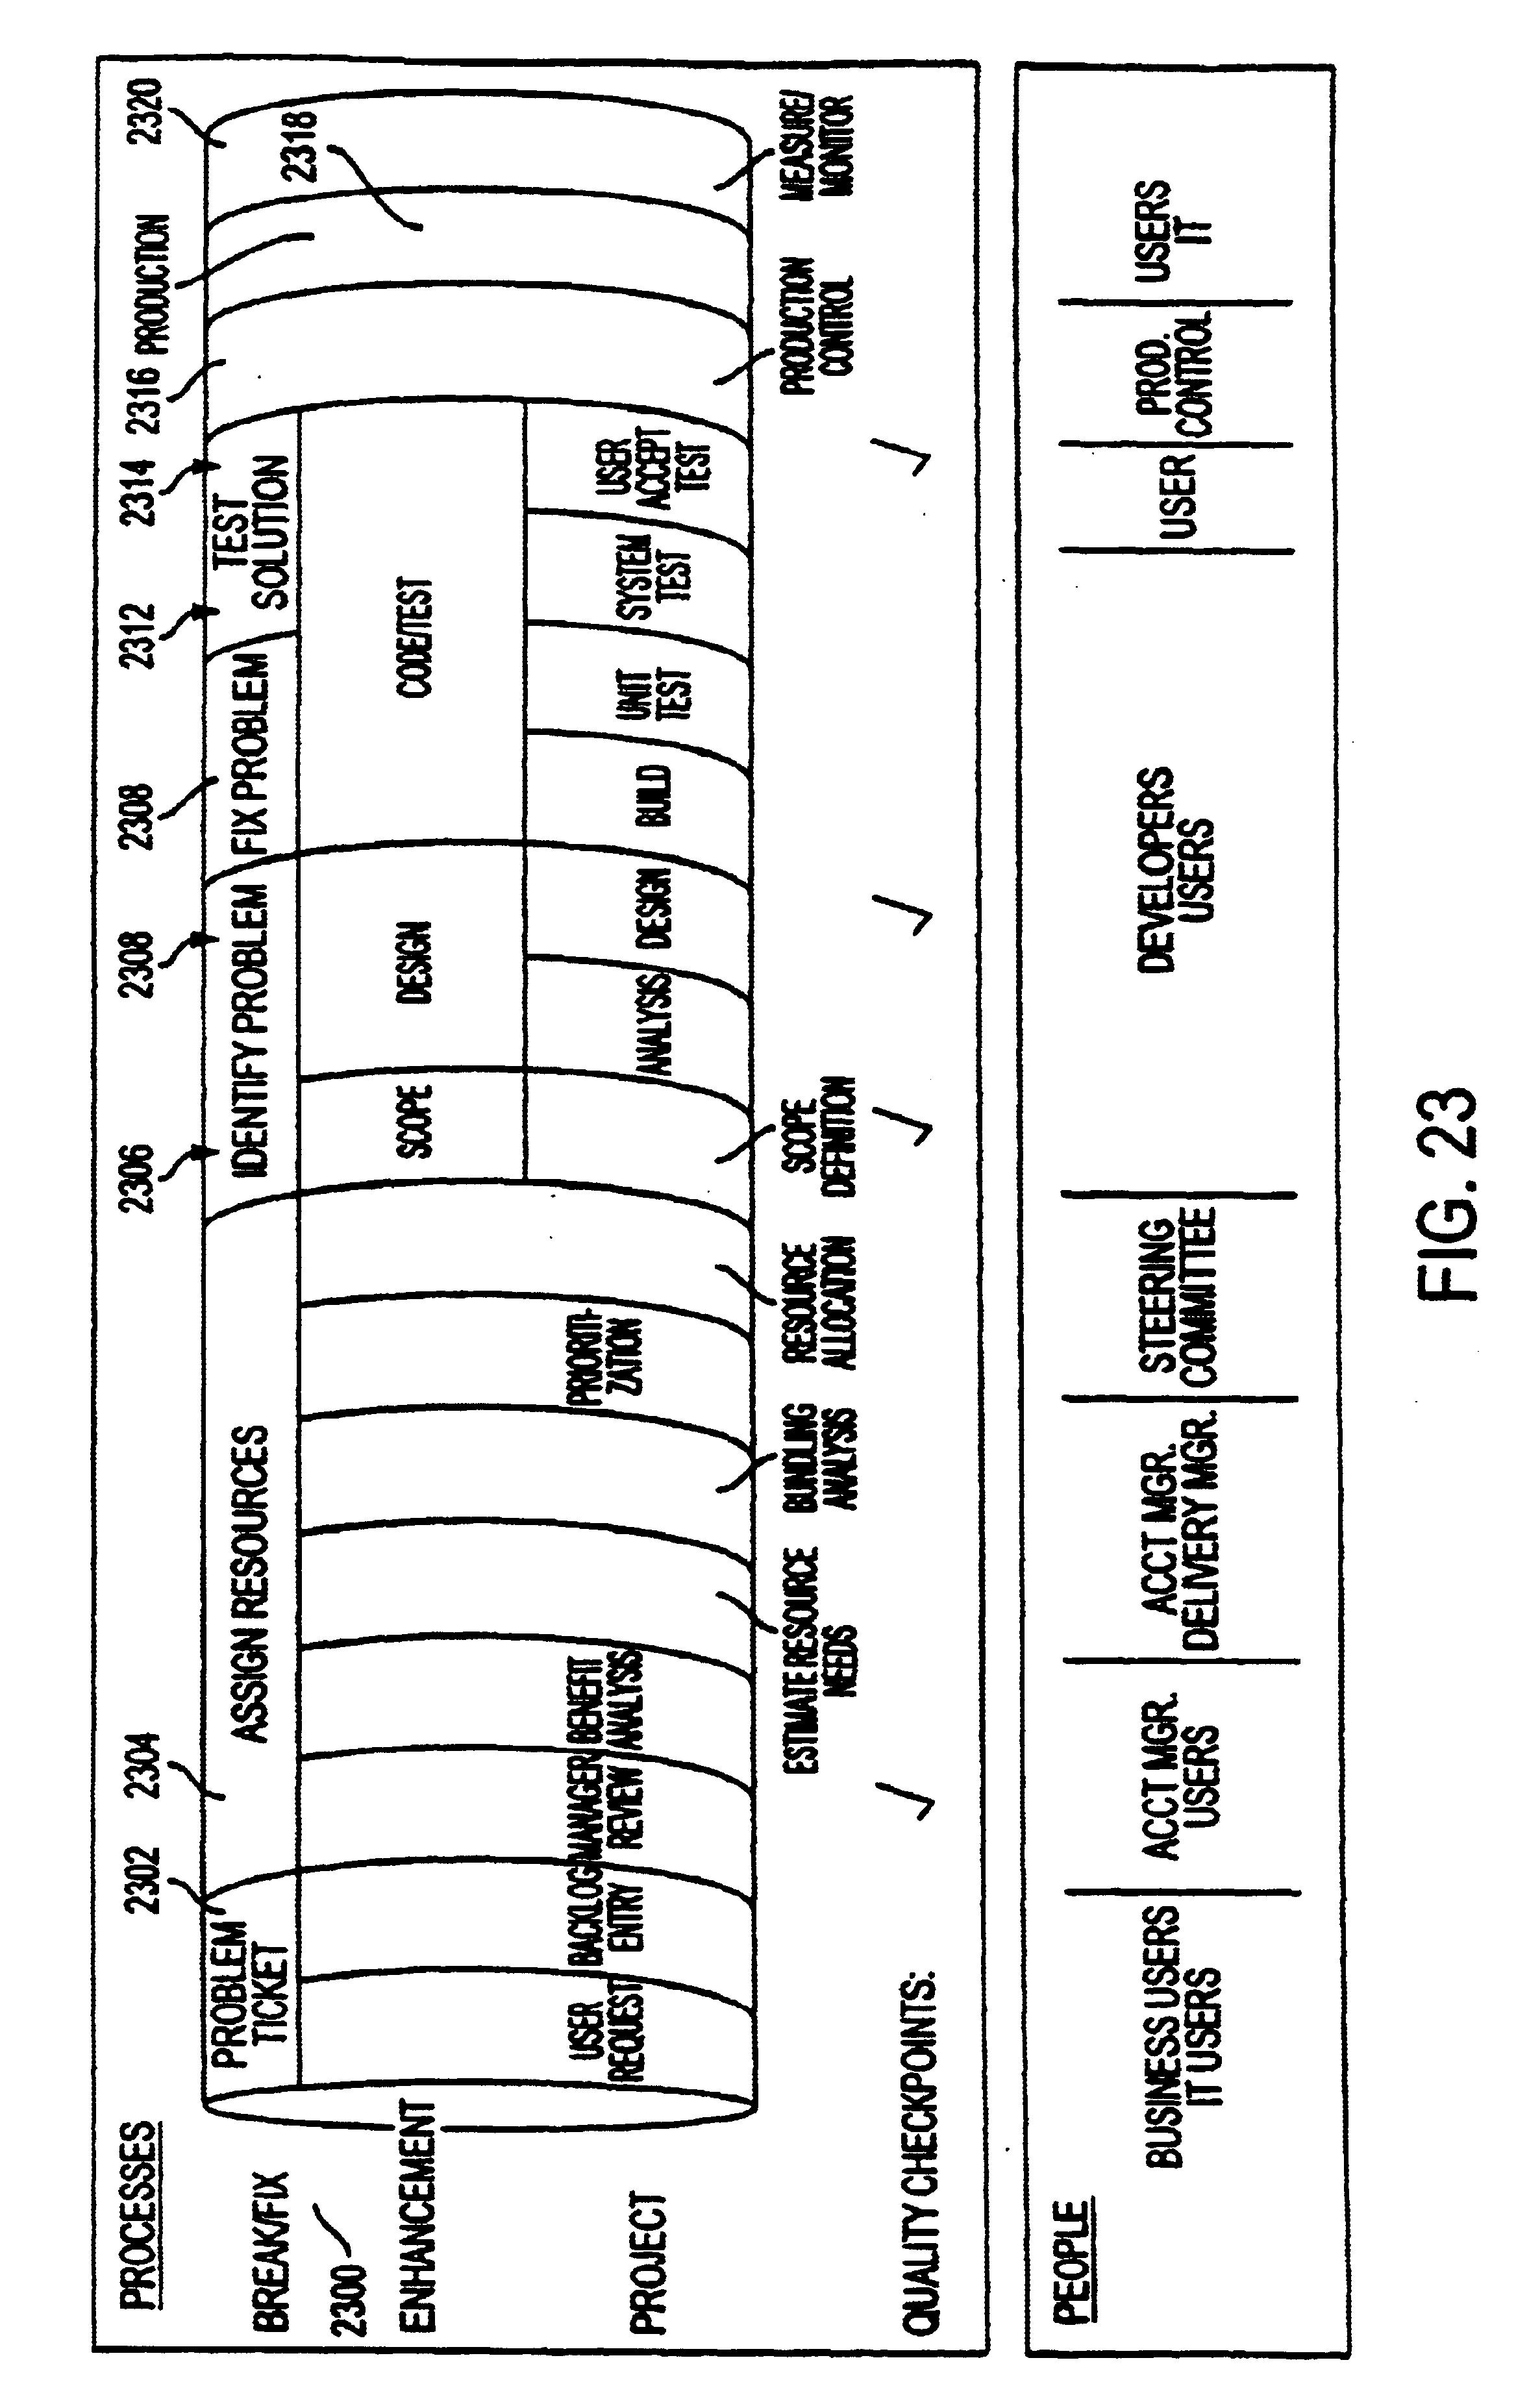 Patent US 6,718,535 B1